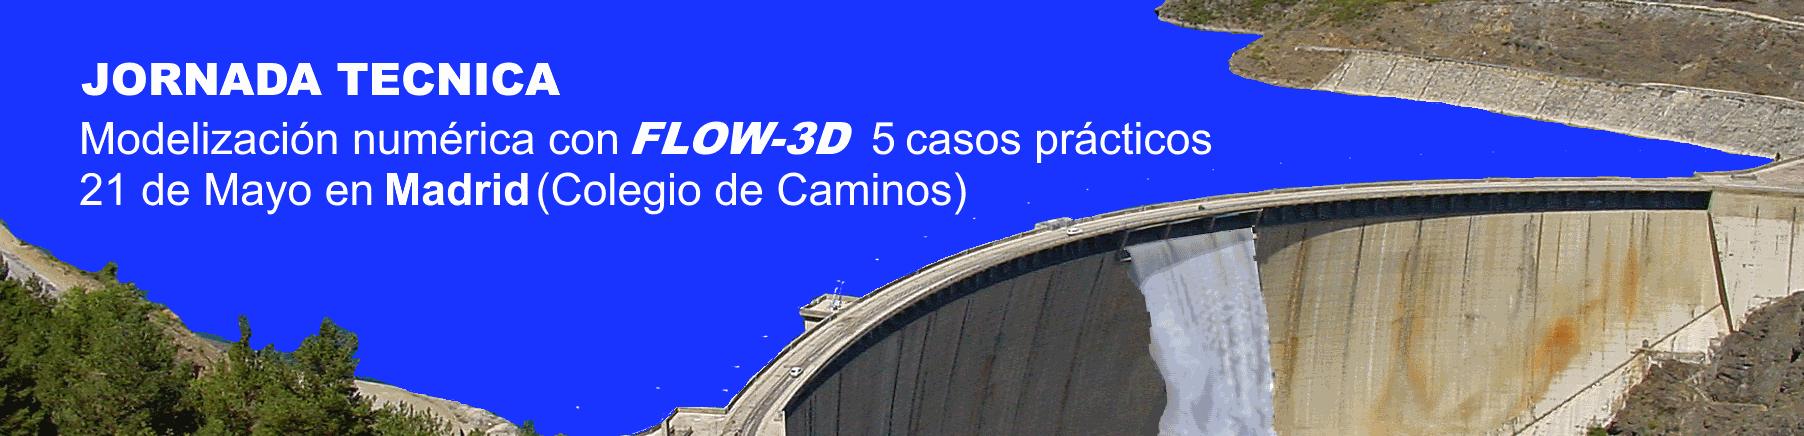 JornadaTecnica FLOW3D Madrid 2019